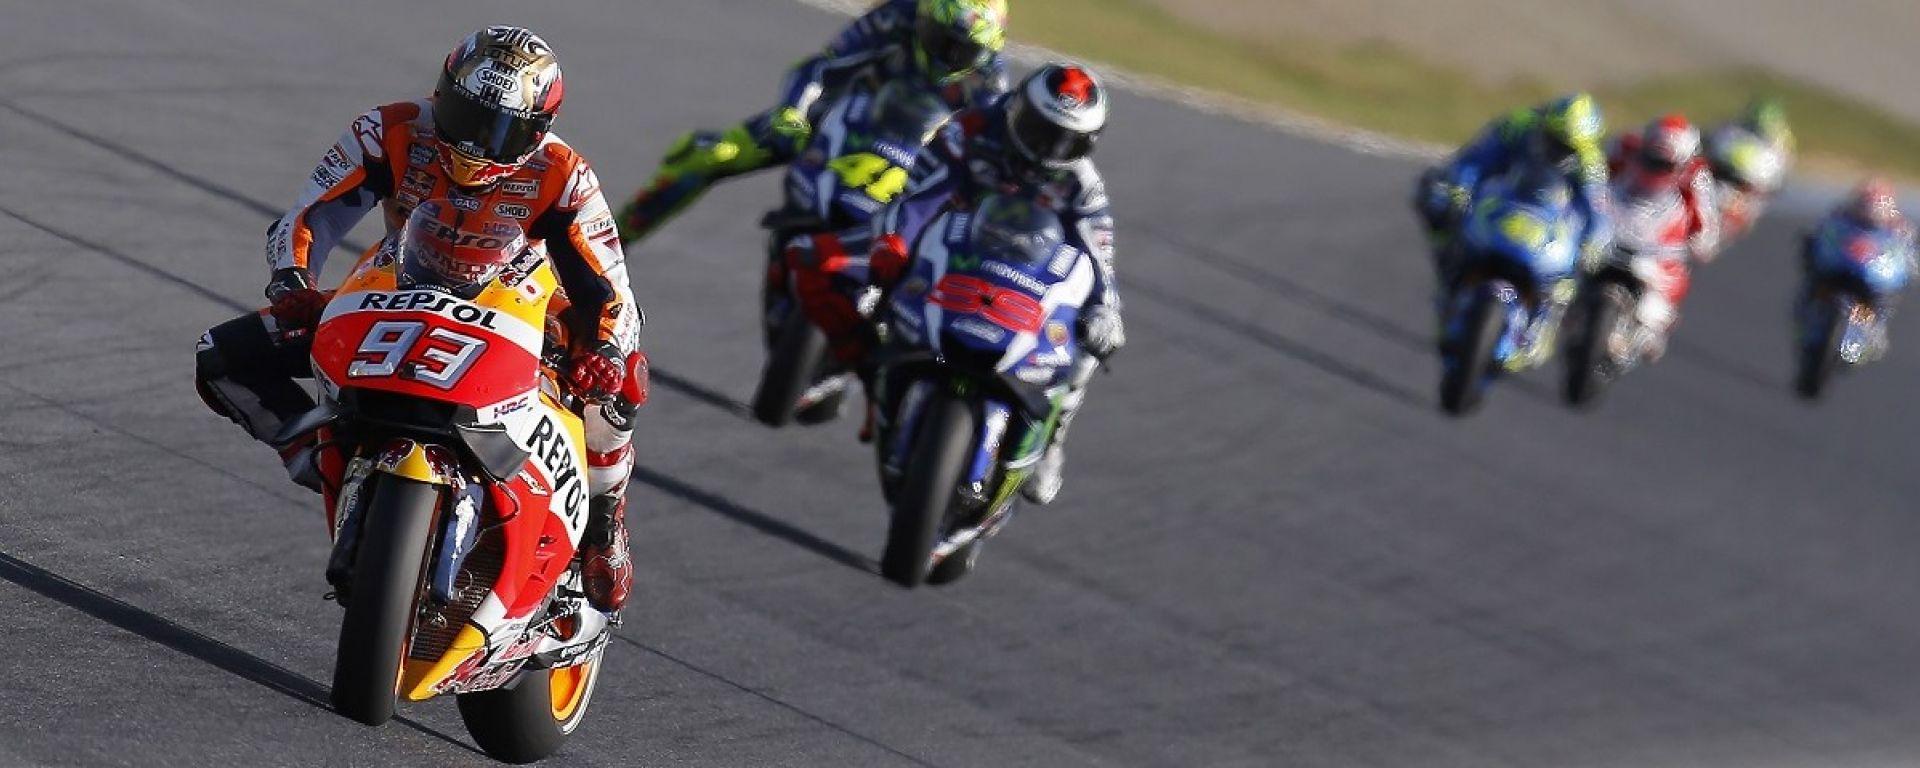 MotoGP Australia 2017